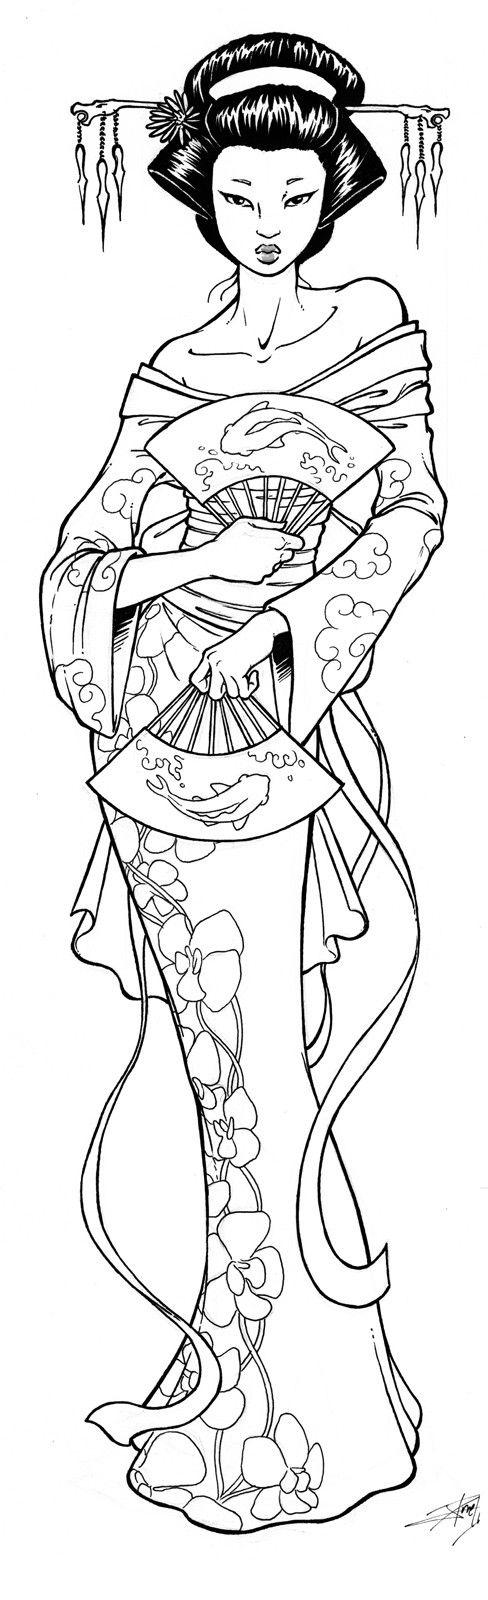 Coloriage Adulte Geisha.Activite Coloriage Geisha Coloriage Coloriage Zen Et